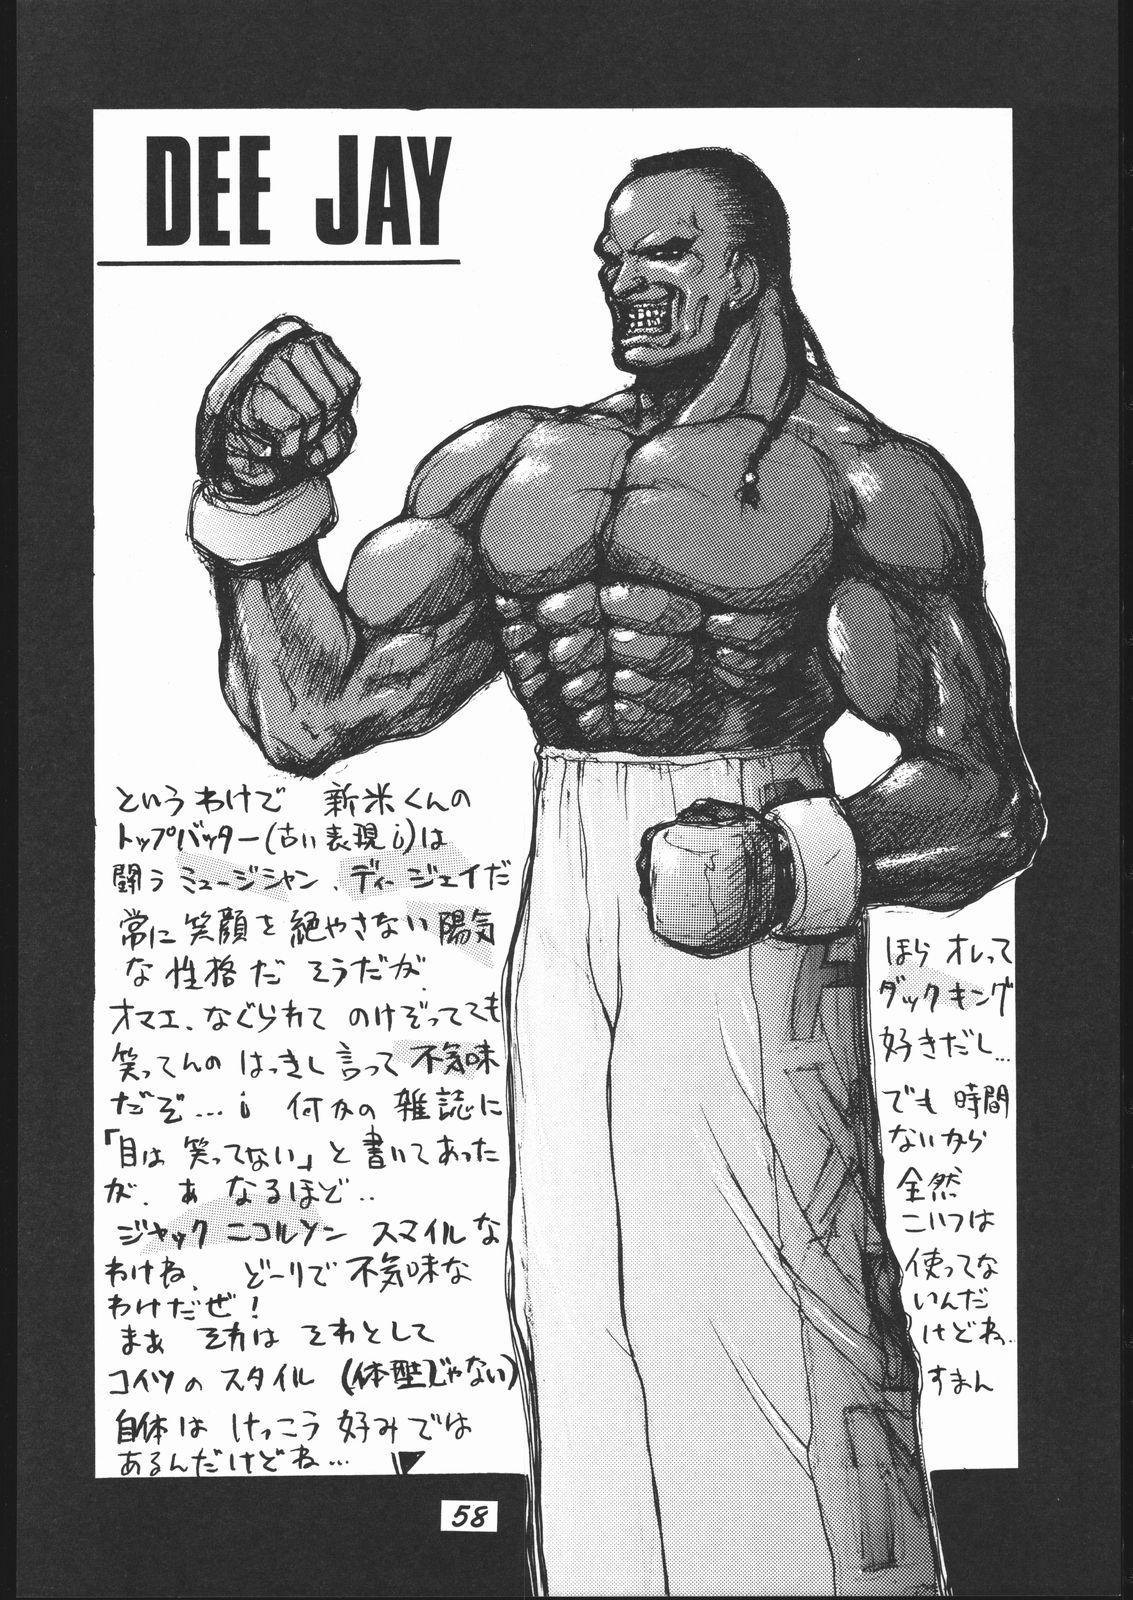 Chun-Li Side A 58